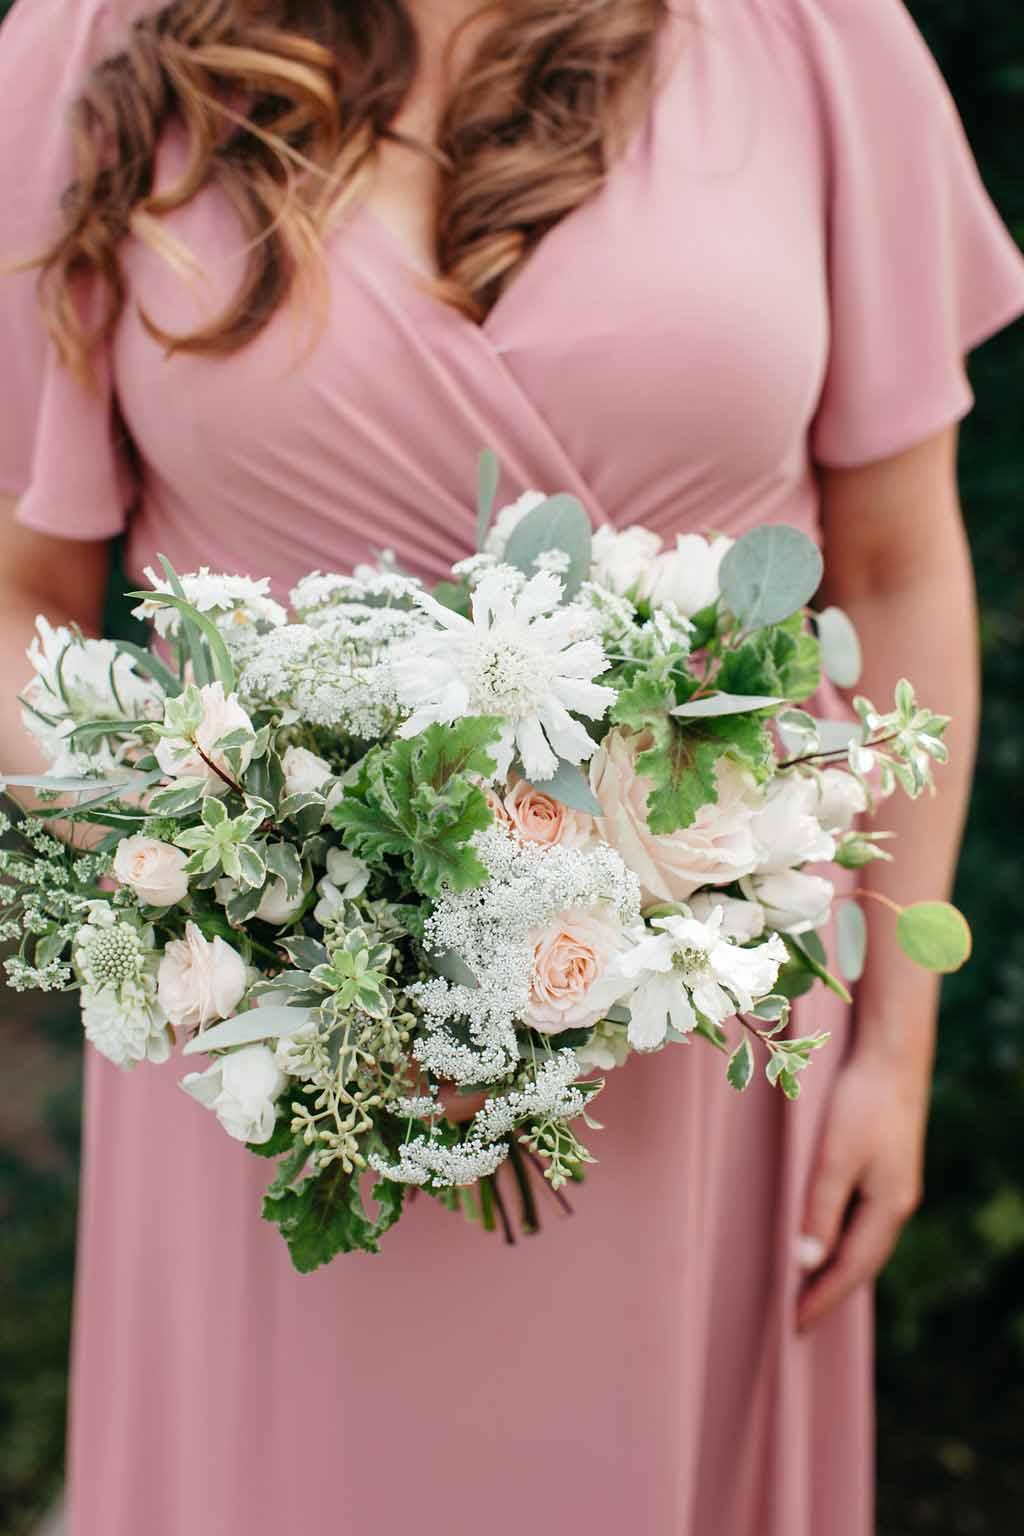 Bride's maid's bouquet with blush garden roses and greenery - Elegant Seattle Garden Wedding by Flora Nova Design Seattle